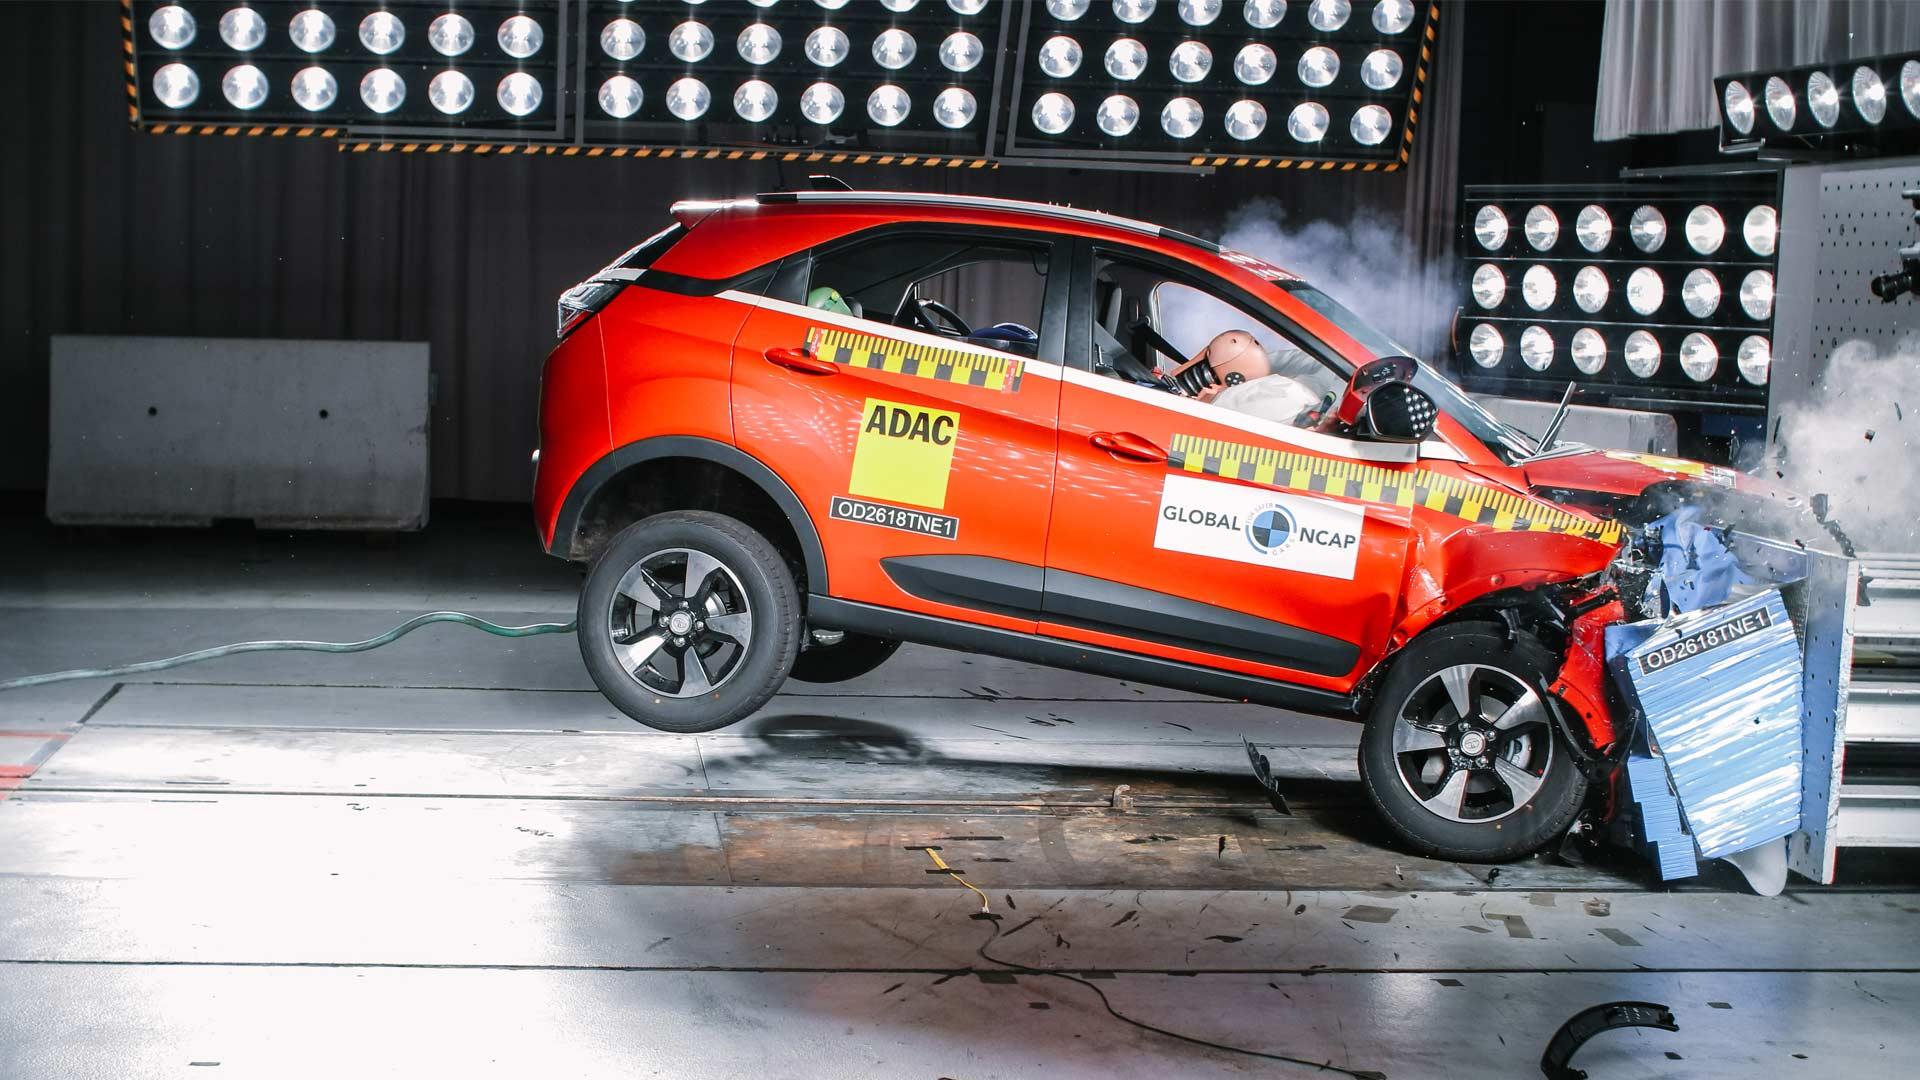 Tata-Nexon-Global-NCAP-crash test 2018